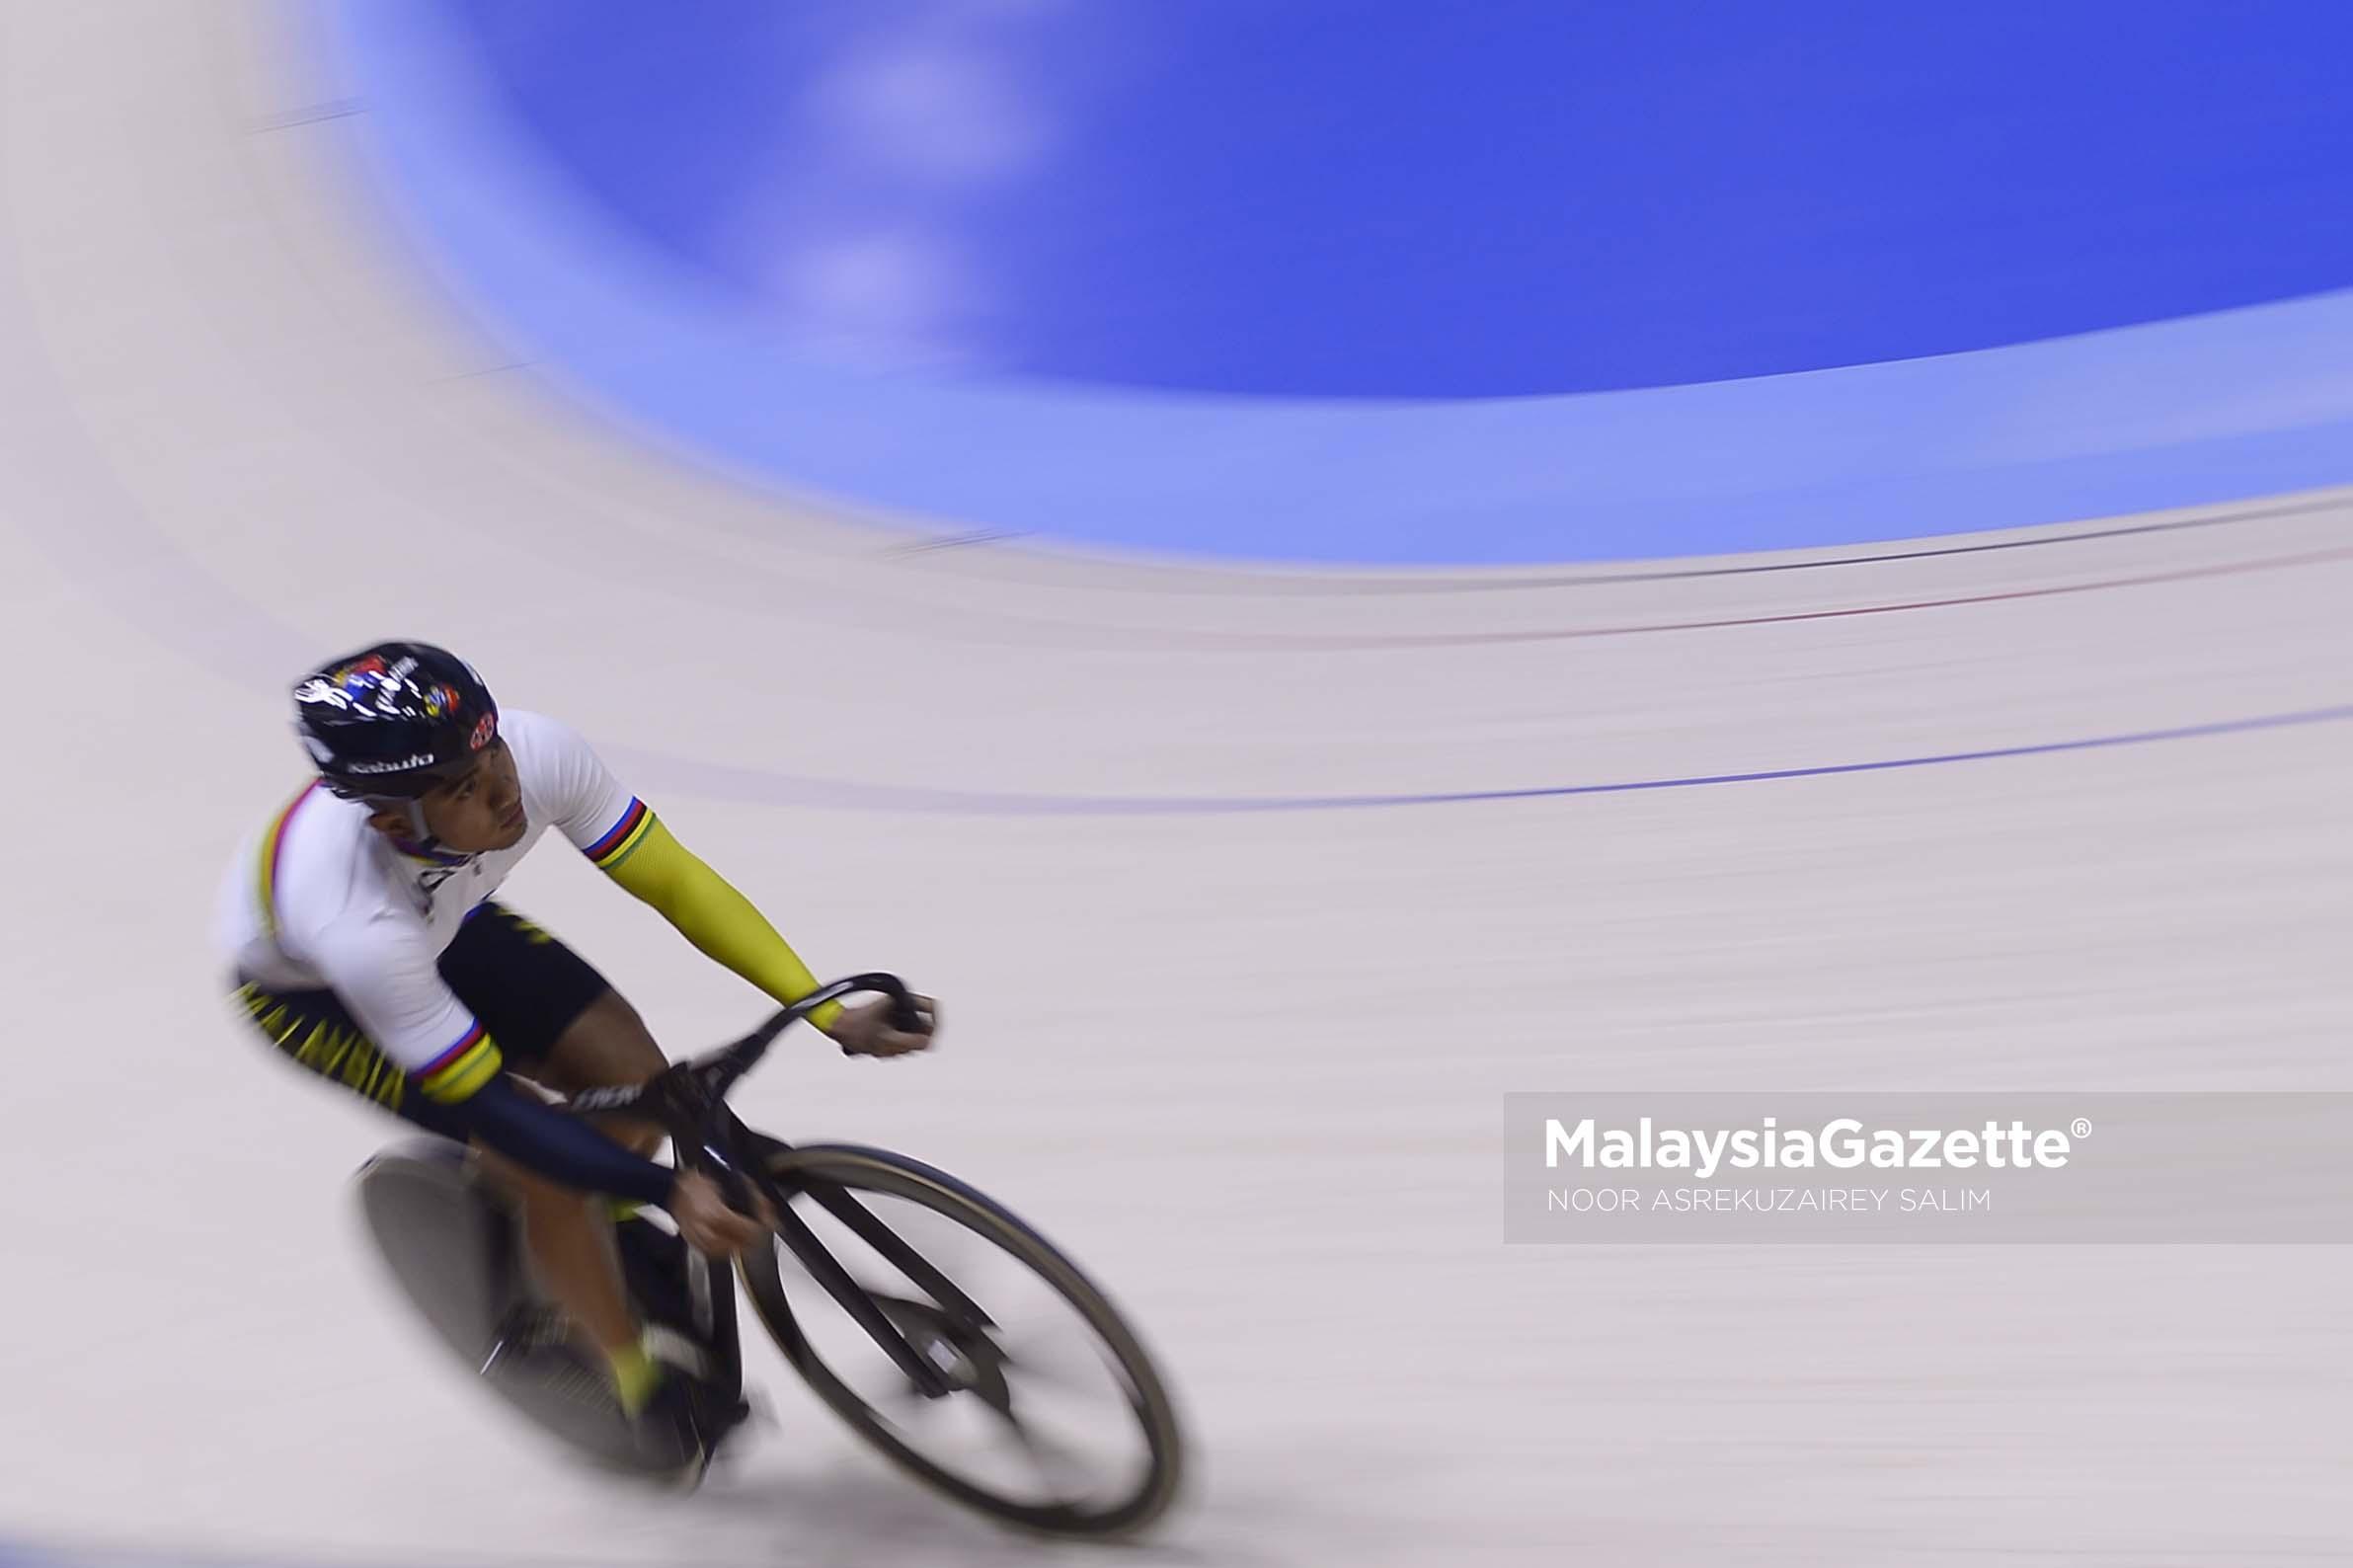 Pelumba Basikal Trek Negara, Azizulhasni Awang lebih dikenali sebagai The Pocket Rocketman ketika menguji trek velodrome nilai sempena Sukan Sea 2017 yang akan berlangsung tidak lama lagi di Velodrome Nilai, Negeri Sembilan. foto NOOR ASREKUZAIREY SALIM, 20 APRIL 2017